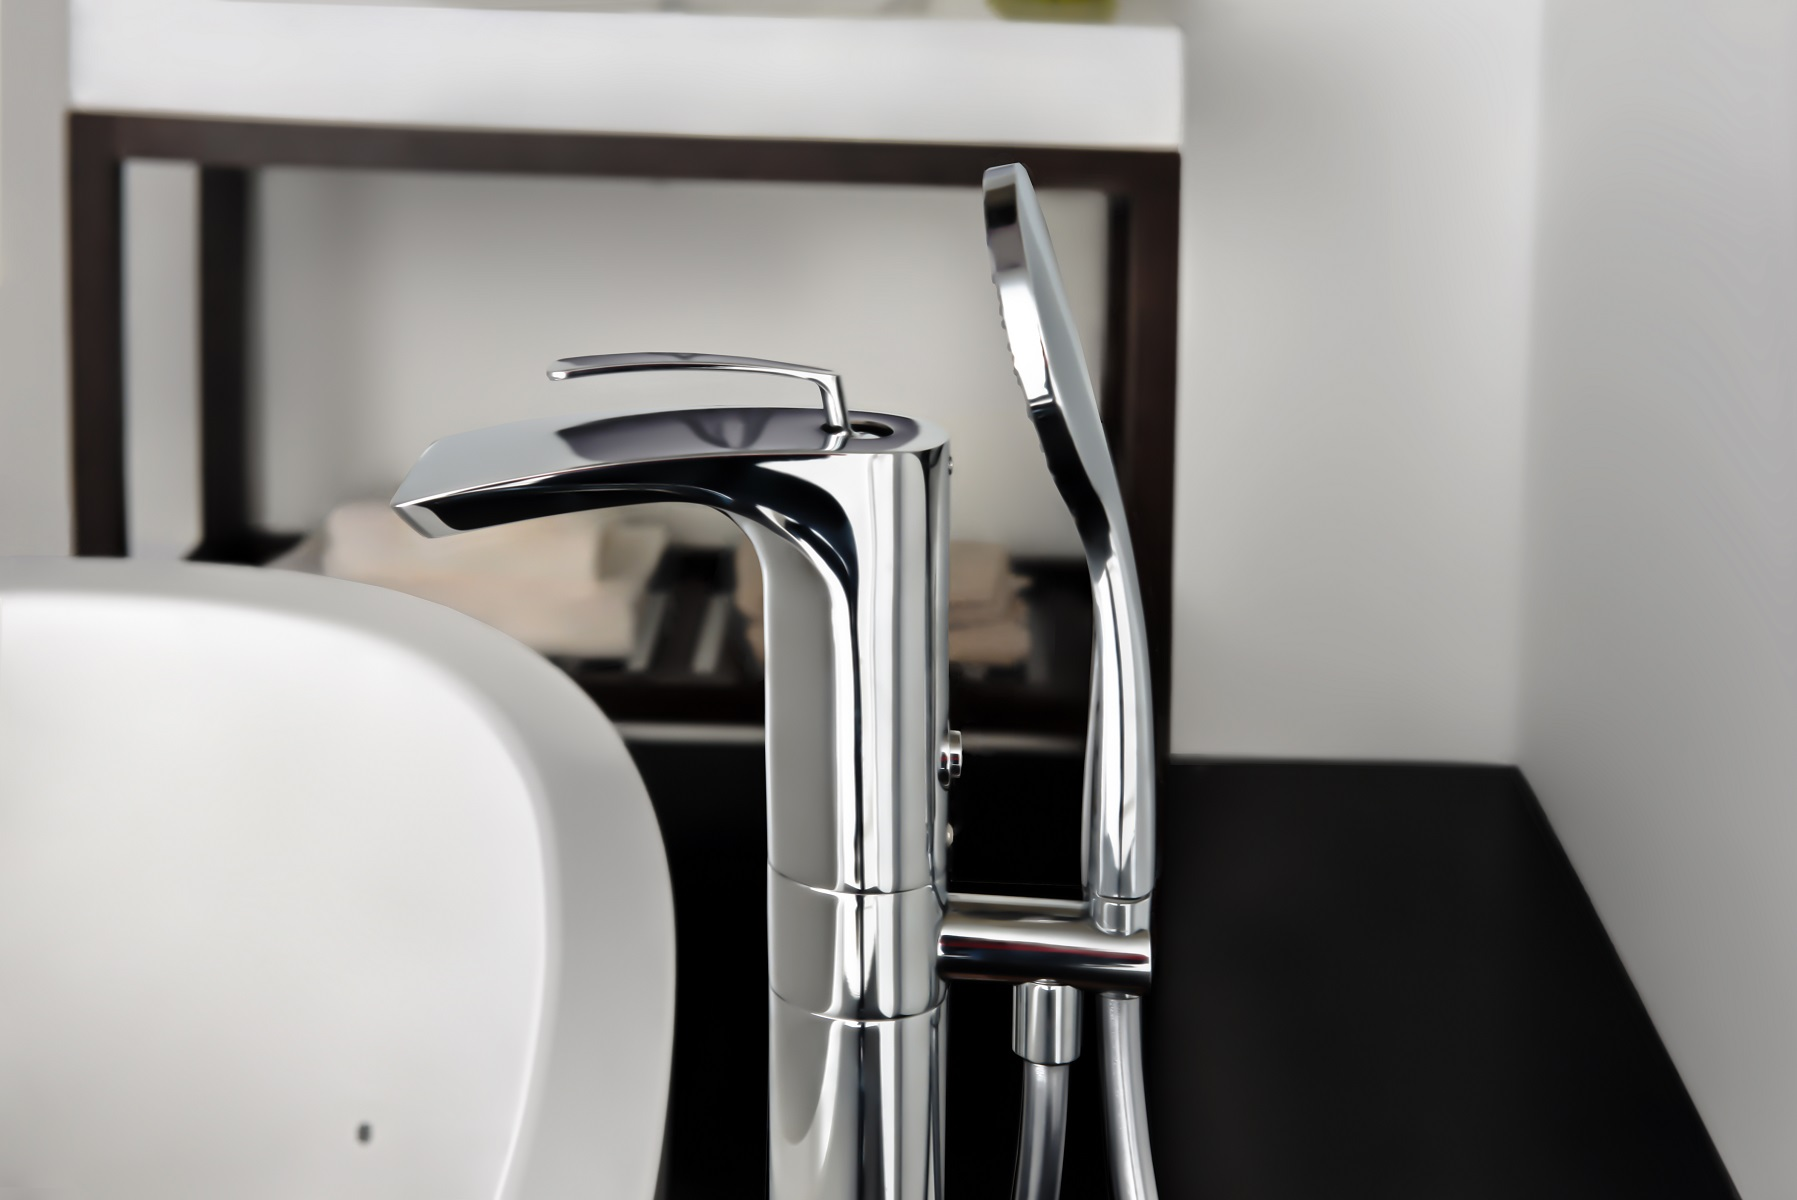 Aquatica bollicine llave para tina de montaje a piso for Llaves de tina de bano